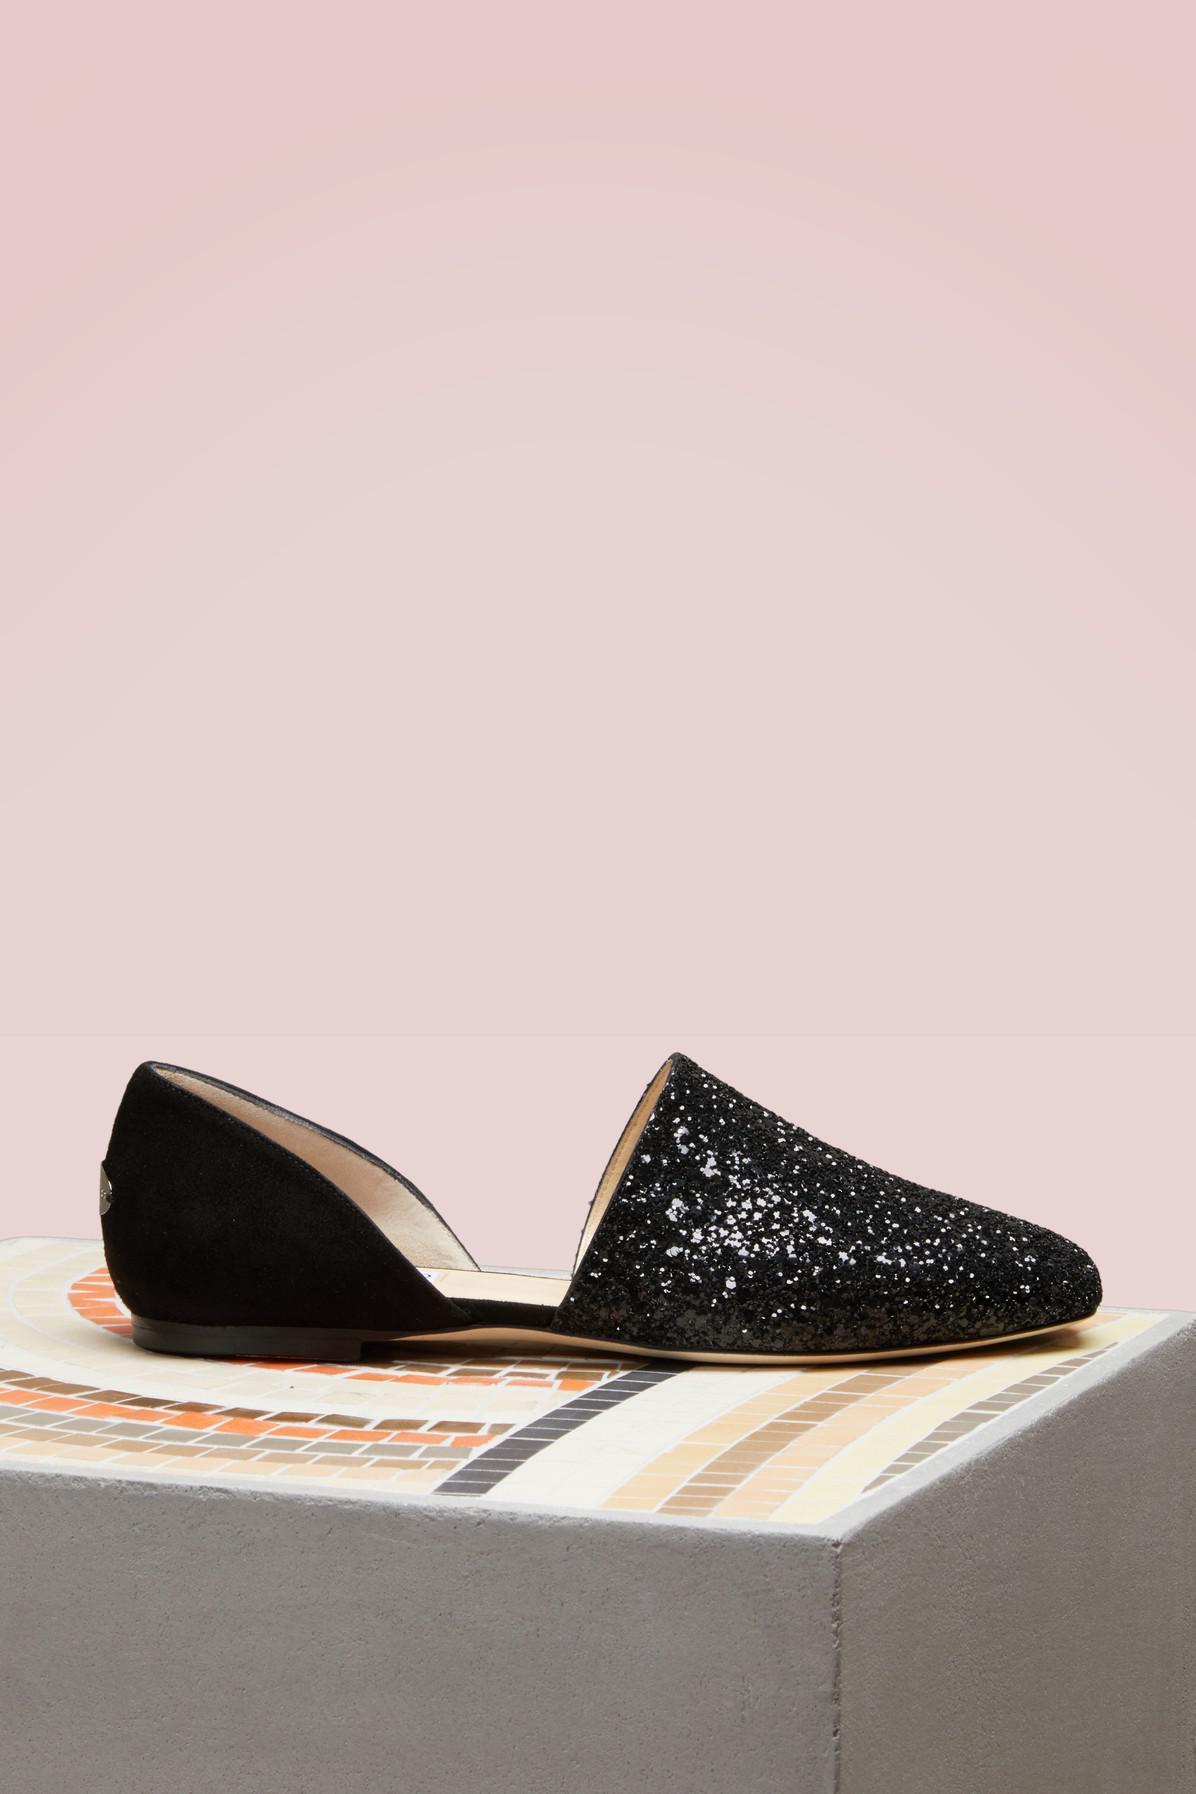 a3daac3c4c86 Lyst - Jimmy Choo Globe Flat Coarse Glitter And Suede Flats in Black